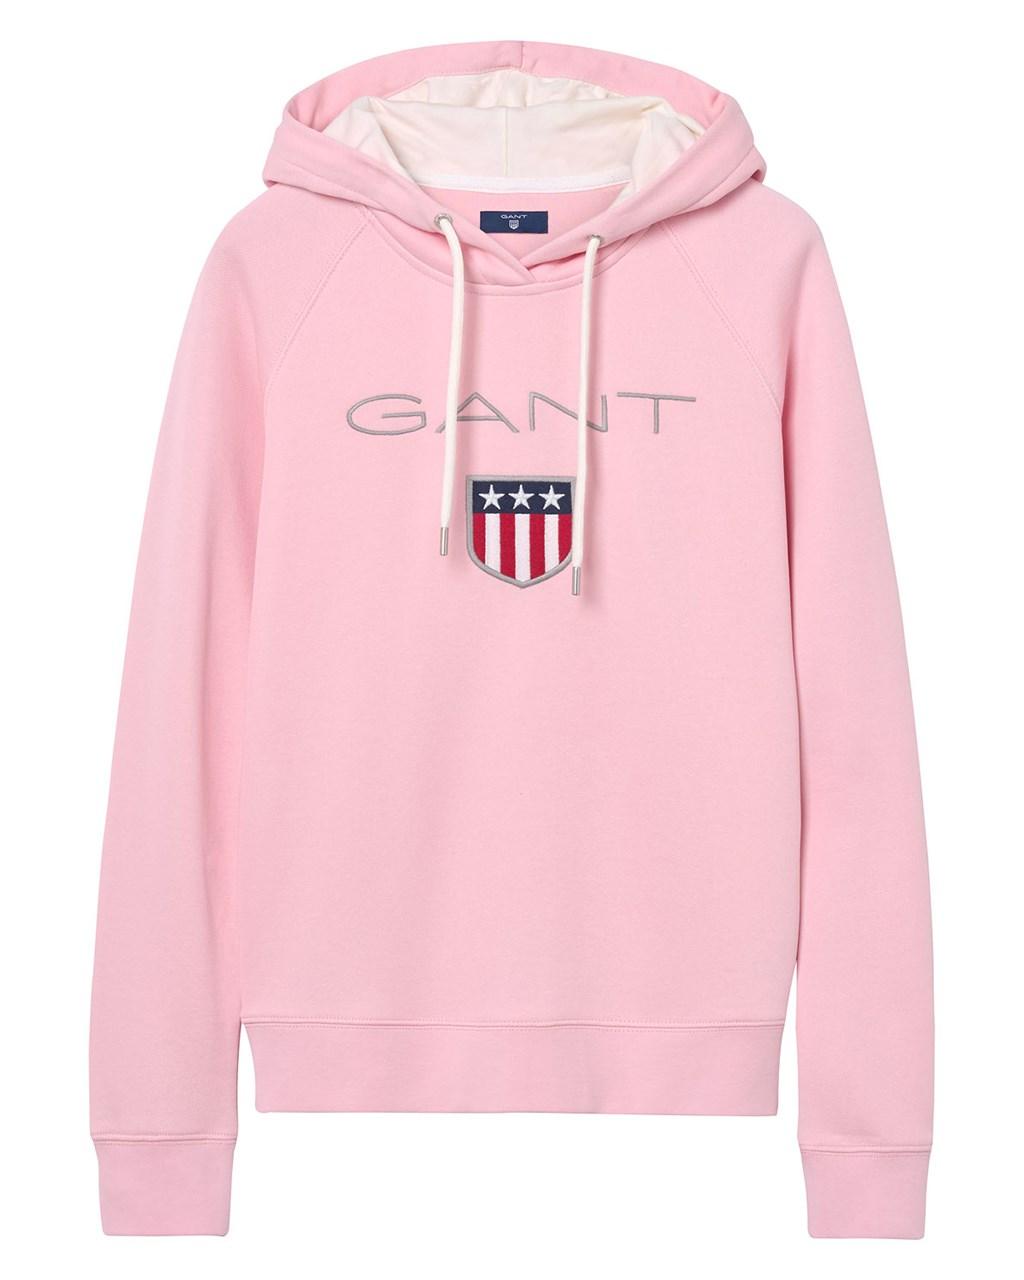 7242673c Gant. Gant Shield Sweat Hoodie W California Pink